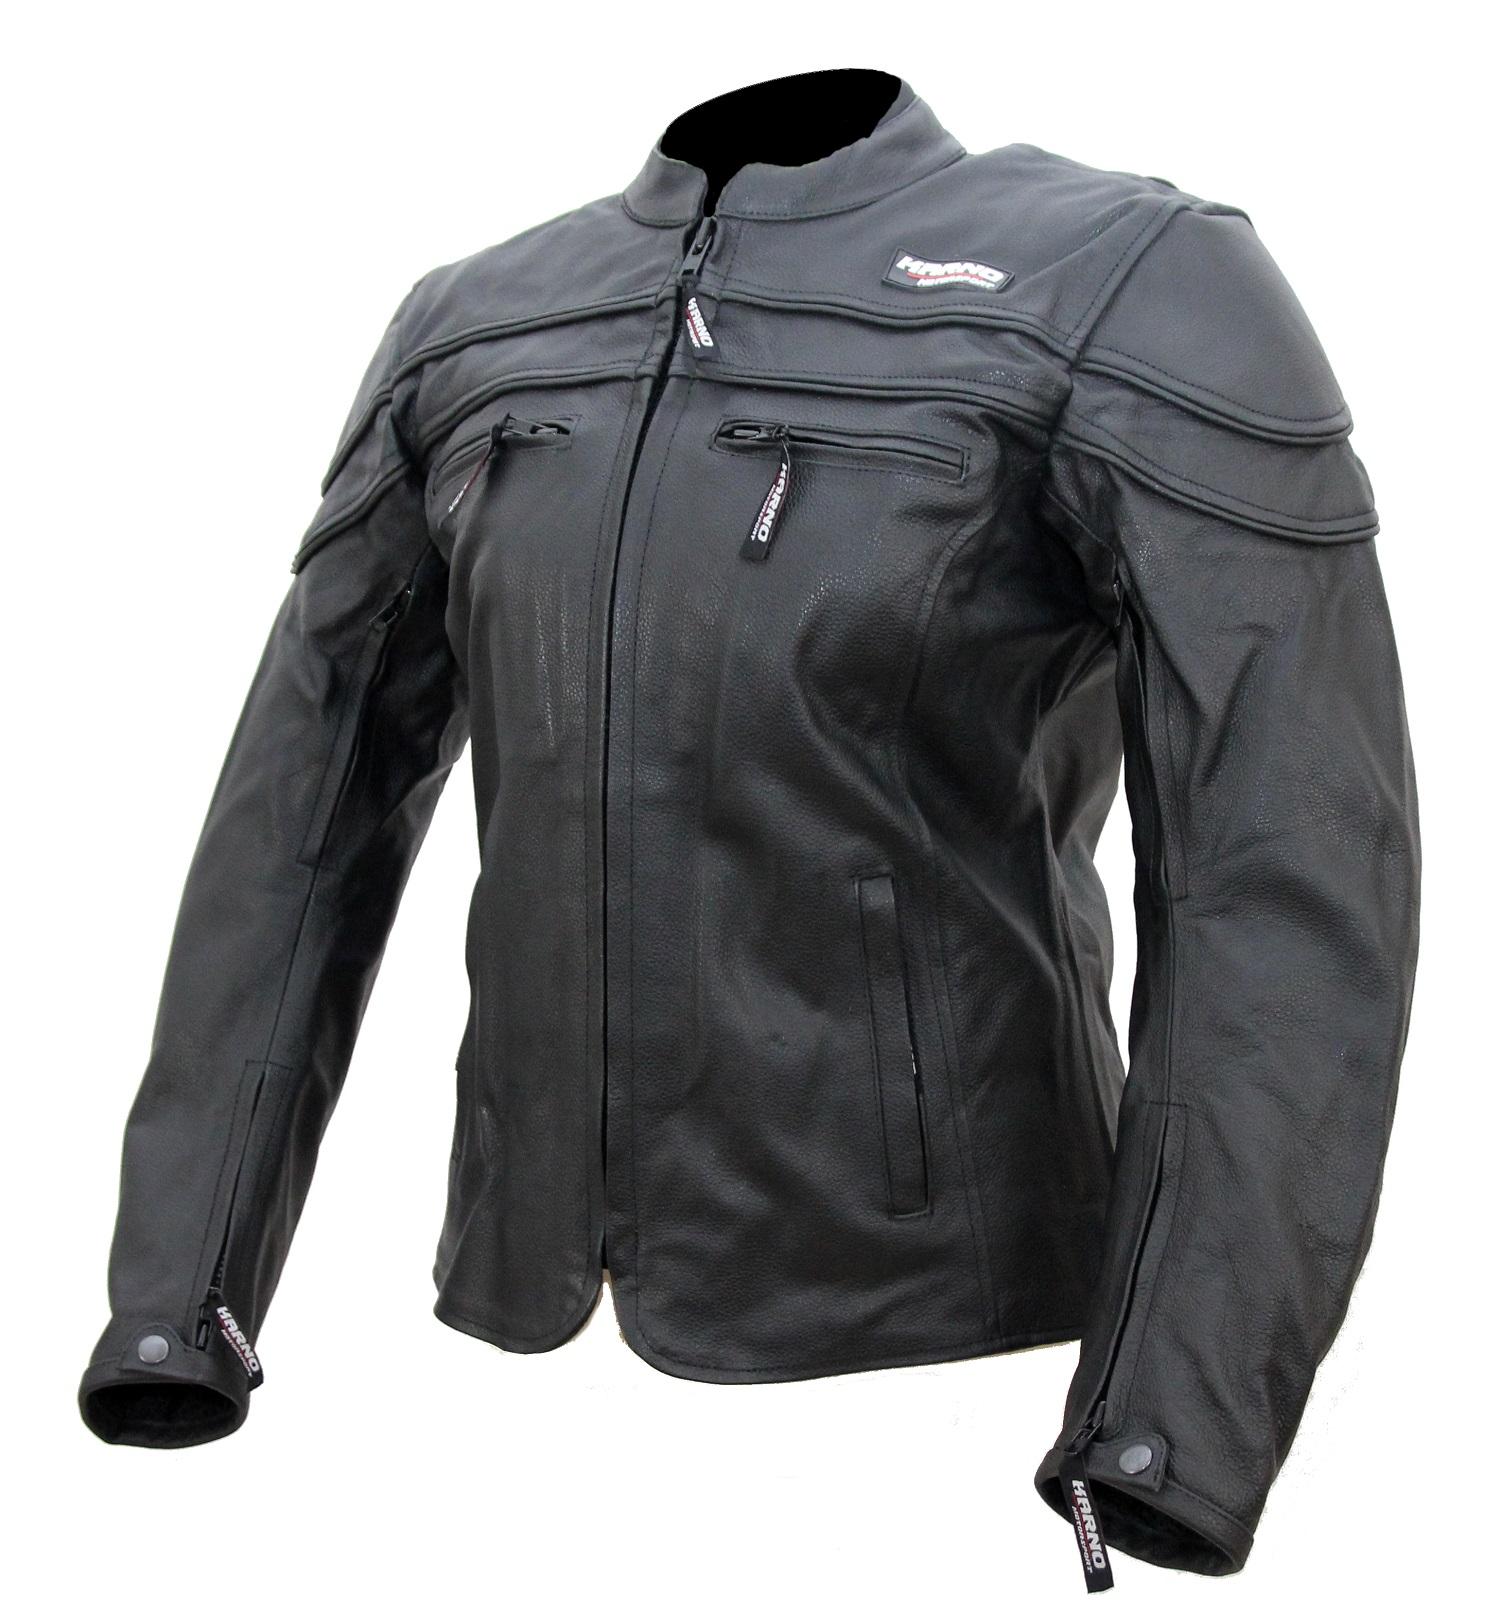 kc031 blouson moto cuir femme noir karno motorsport doublure hiver amovible blouson veste. Black Bedroom Furniture Sets. Home Design Ideas